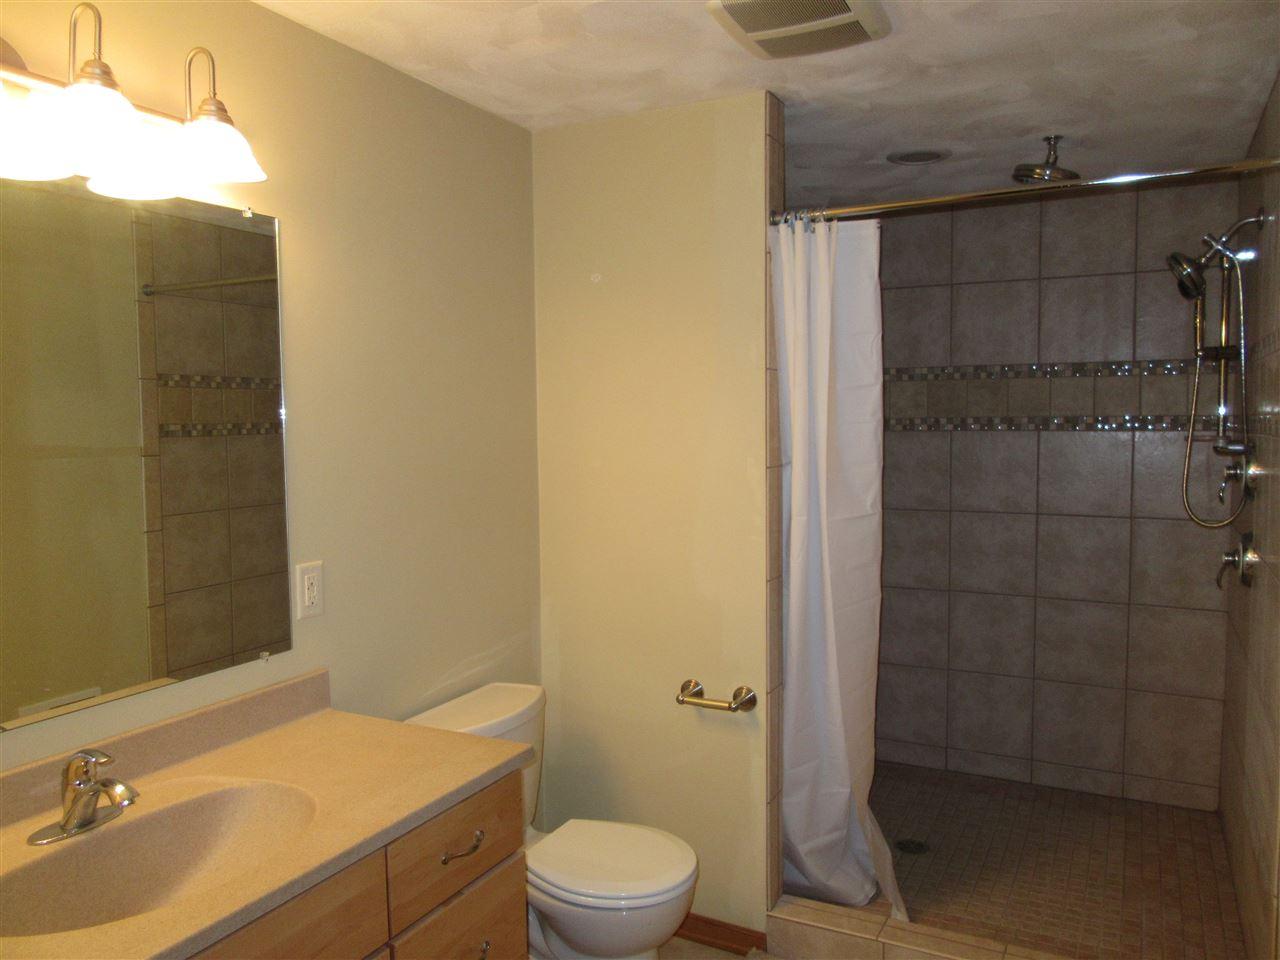 Bathroom Fixtures Janesville Wi 1727 st george ln, janesville, wi 53546 mls# 1773736 - movoto